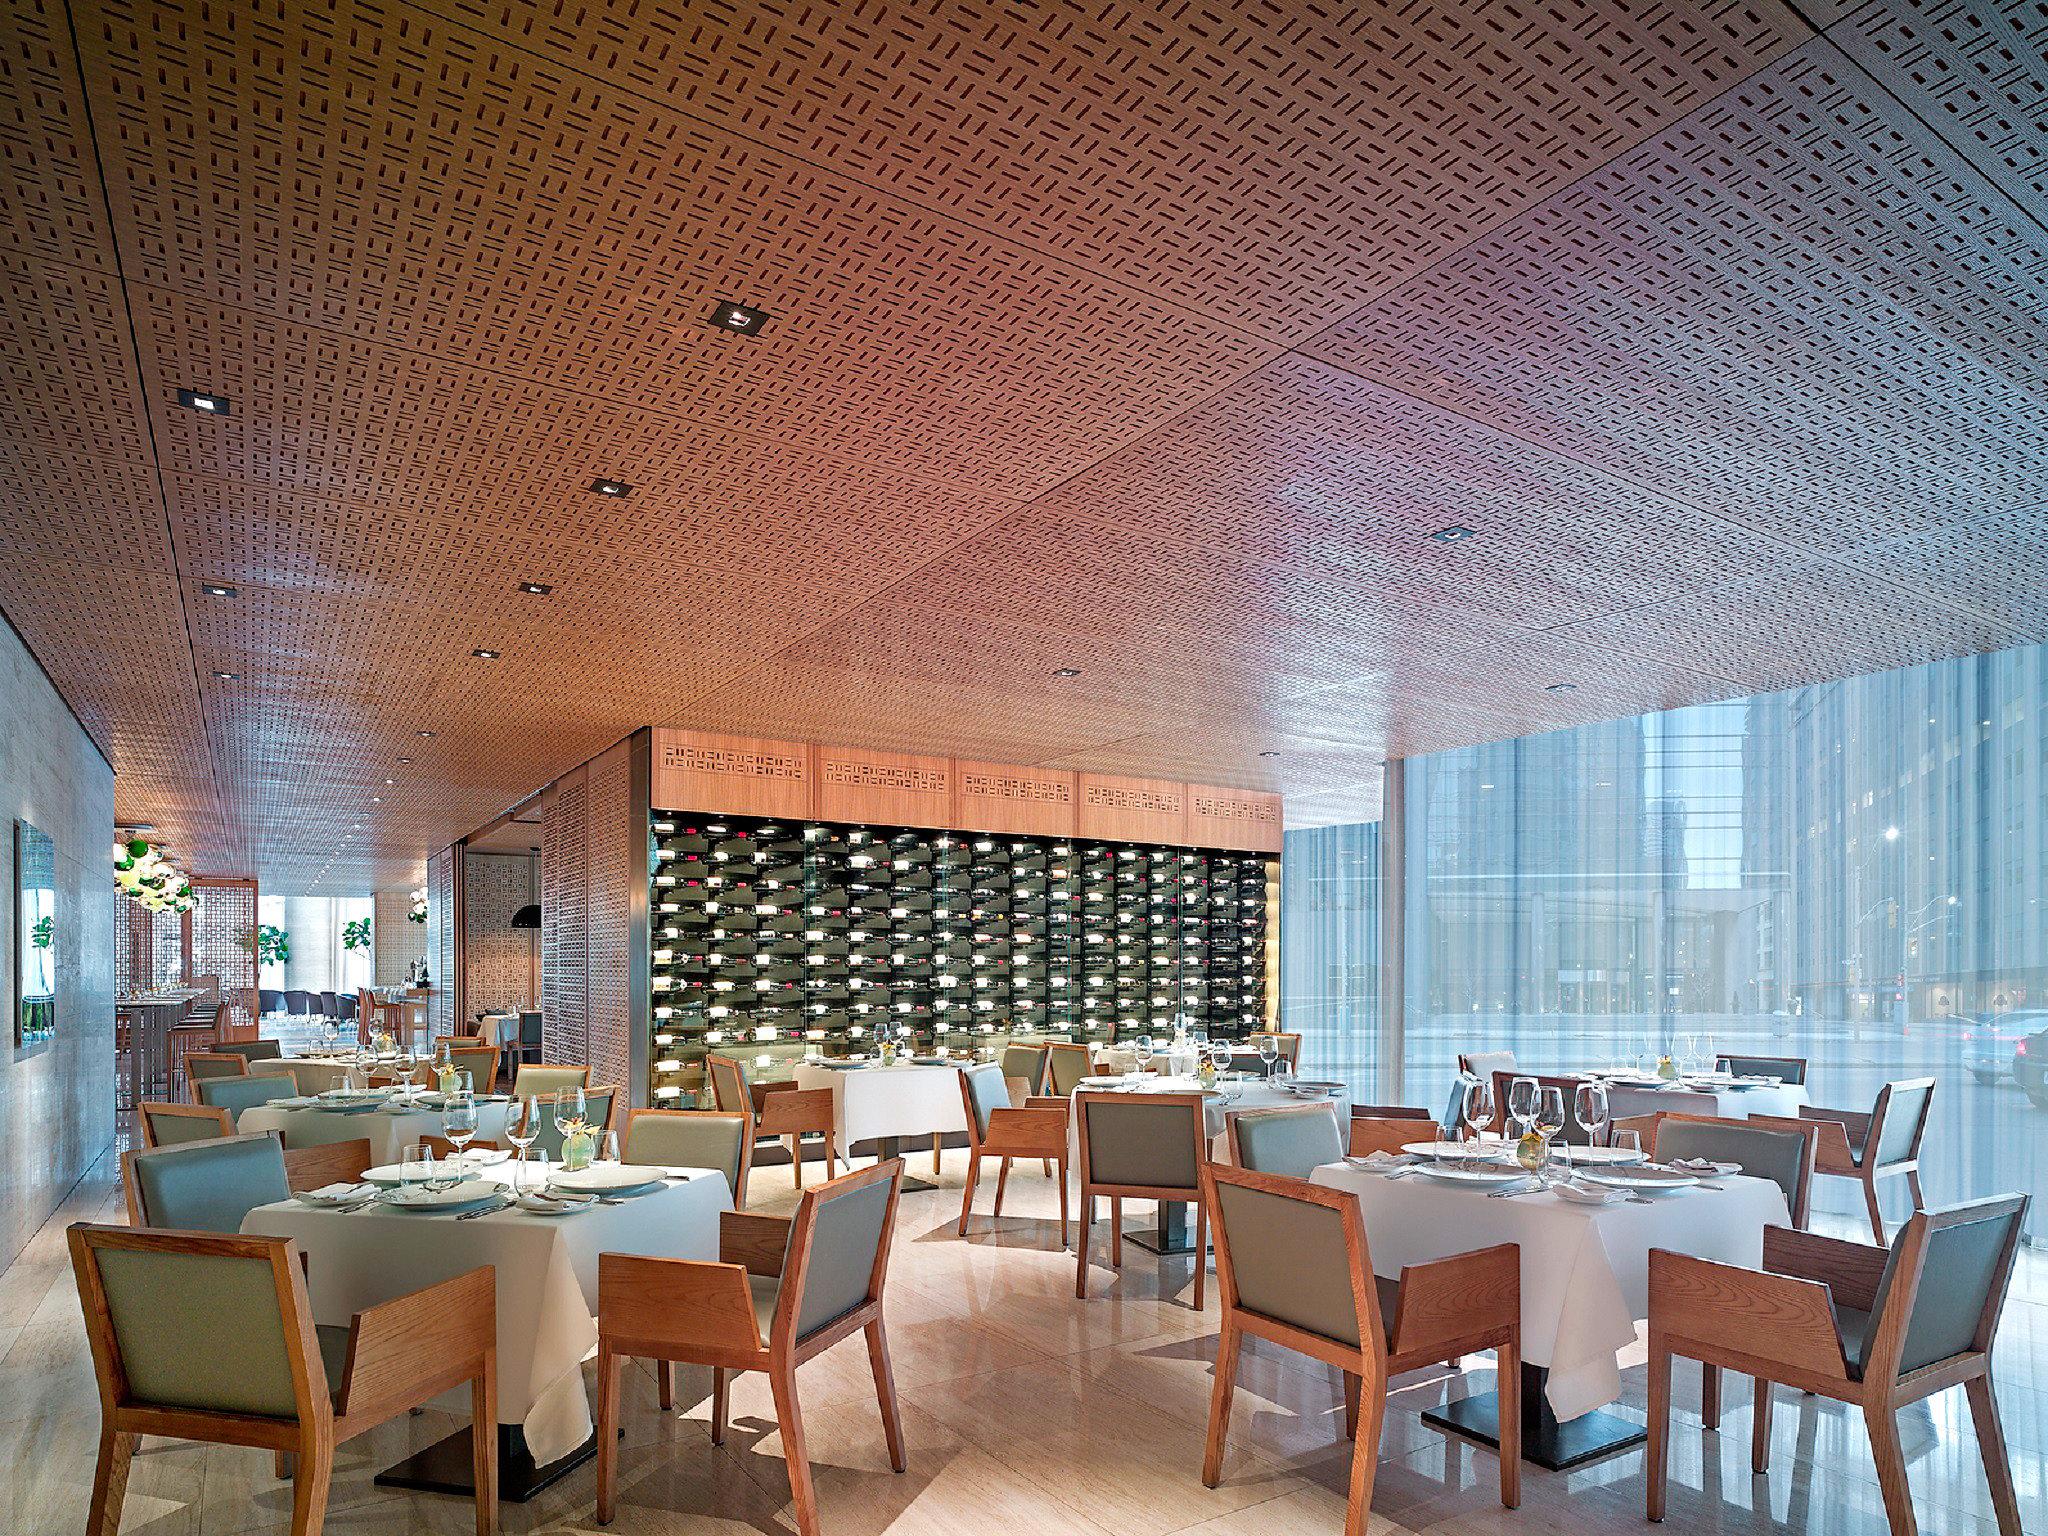 Dining Drink Eat Hip Modern Scenic views chair property restaurant Lobby Resort function hall set